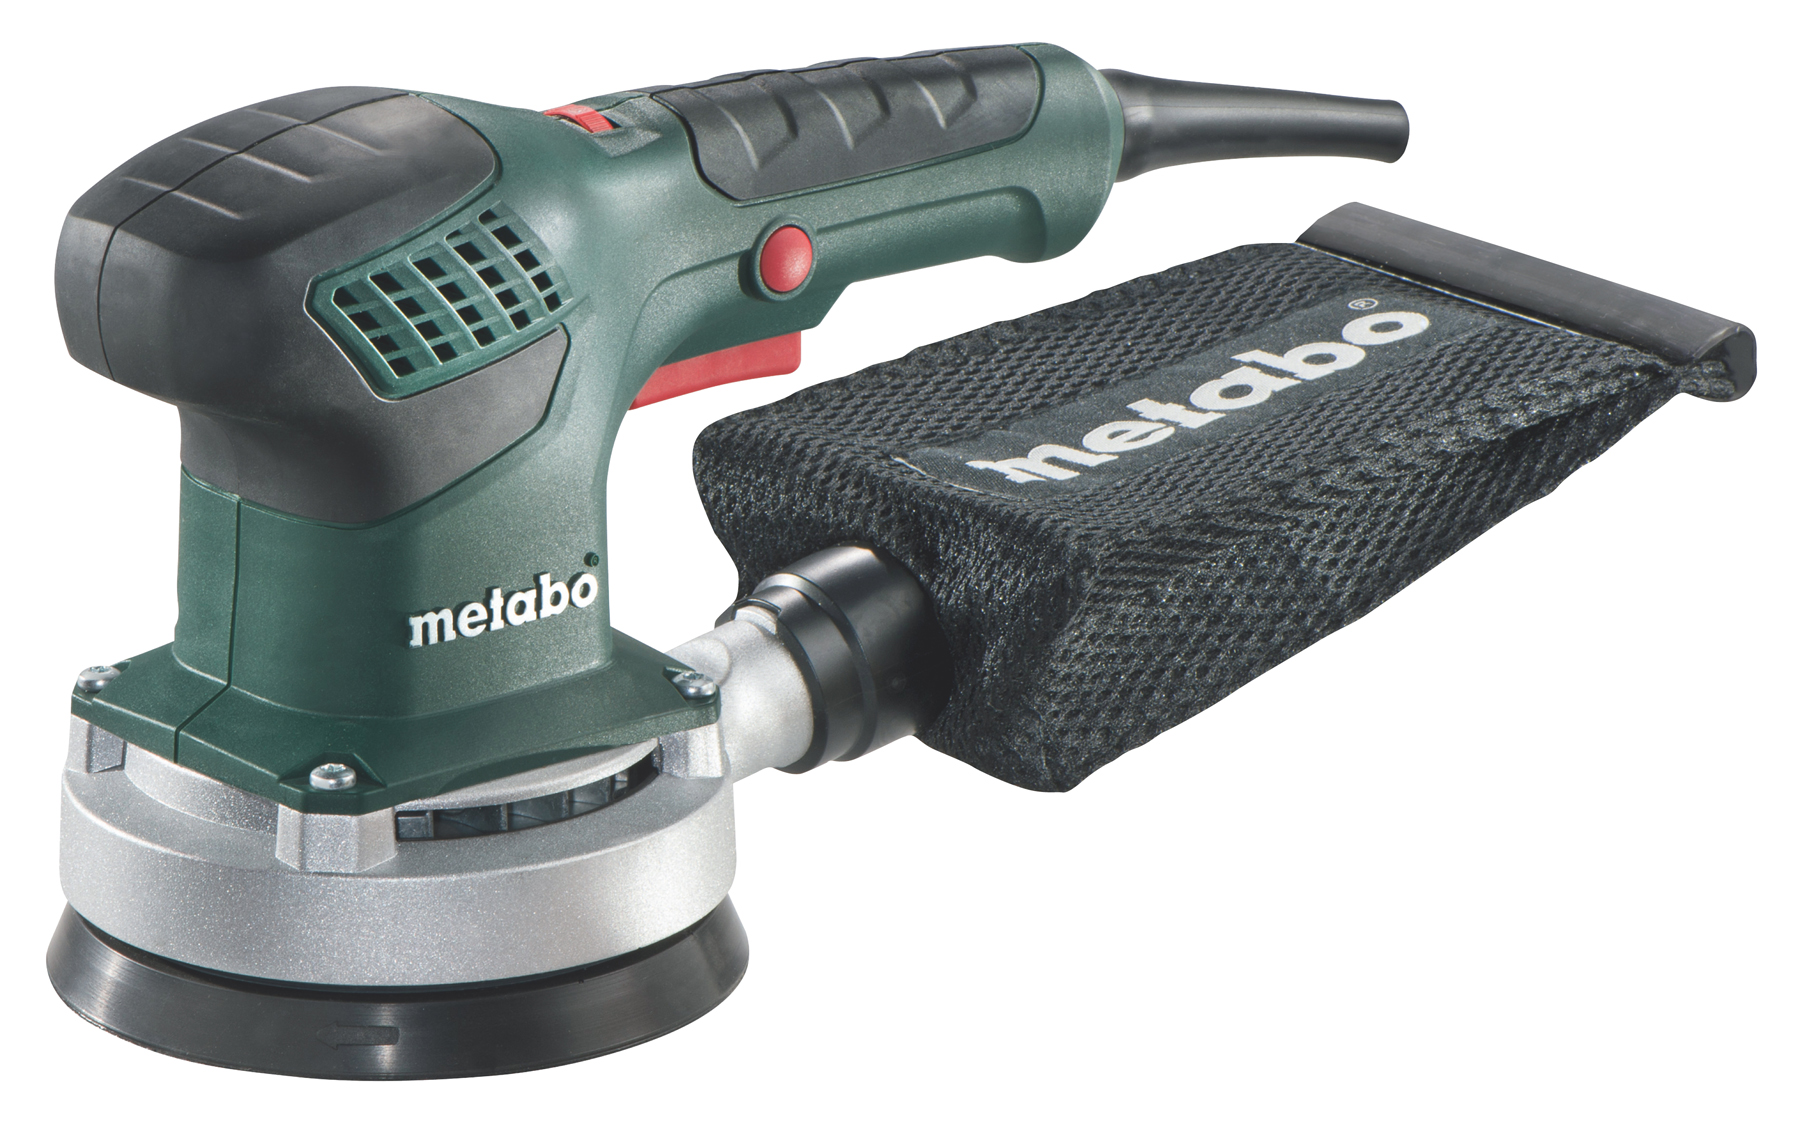 Metabo SXE 3125 (600443500) - эксцентриковая шлифмашина + кейс (Green)